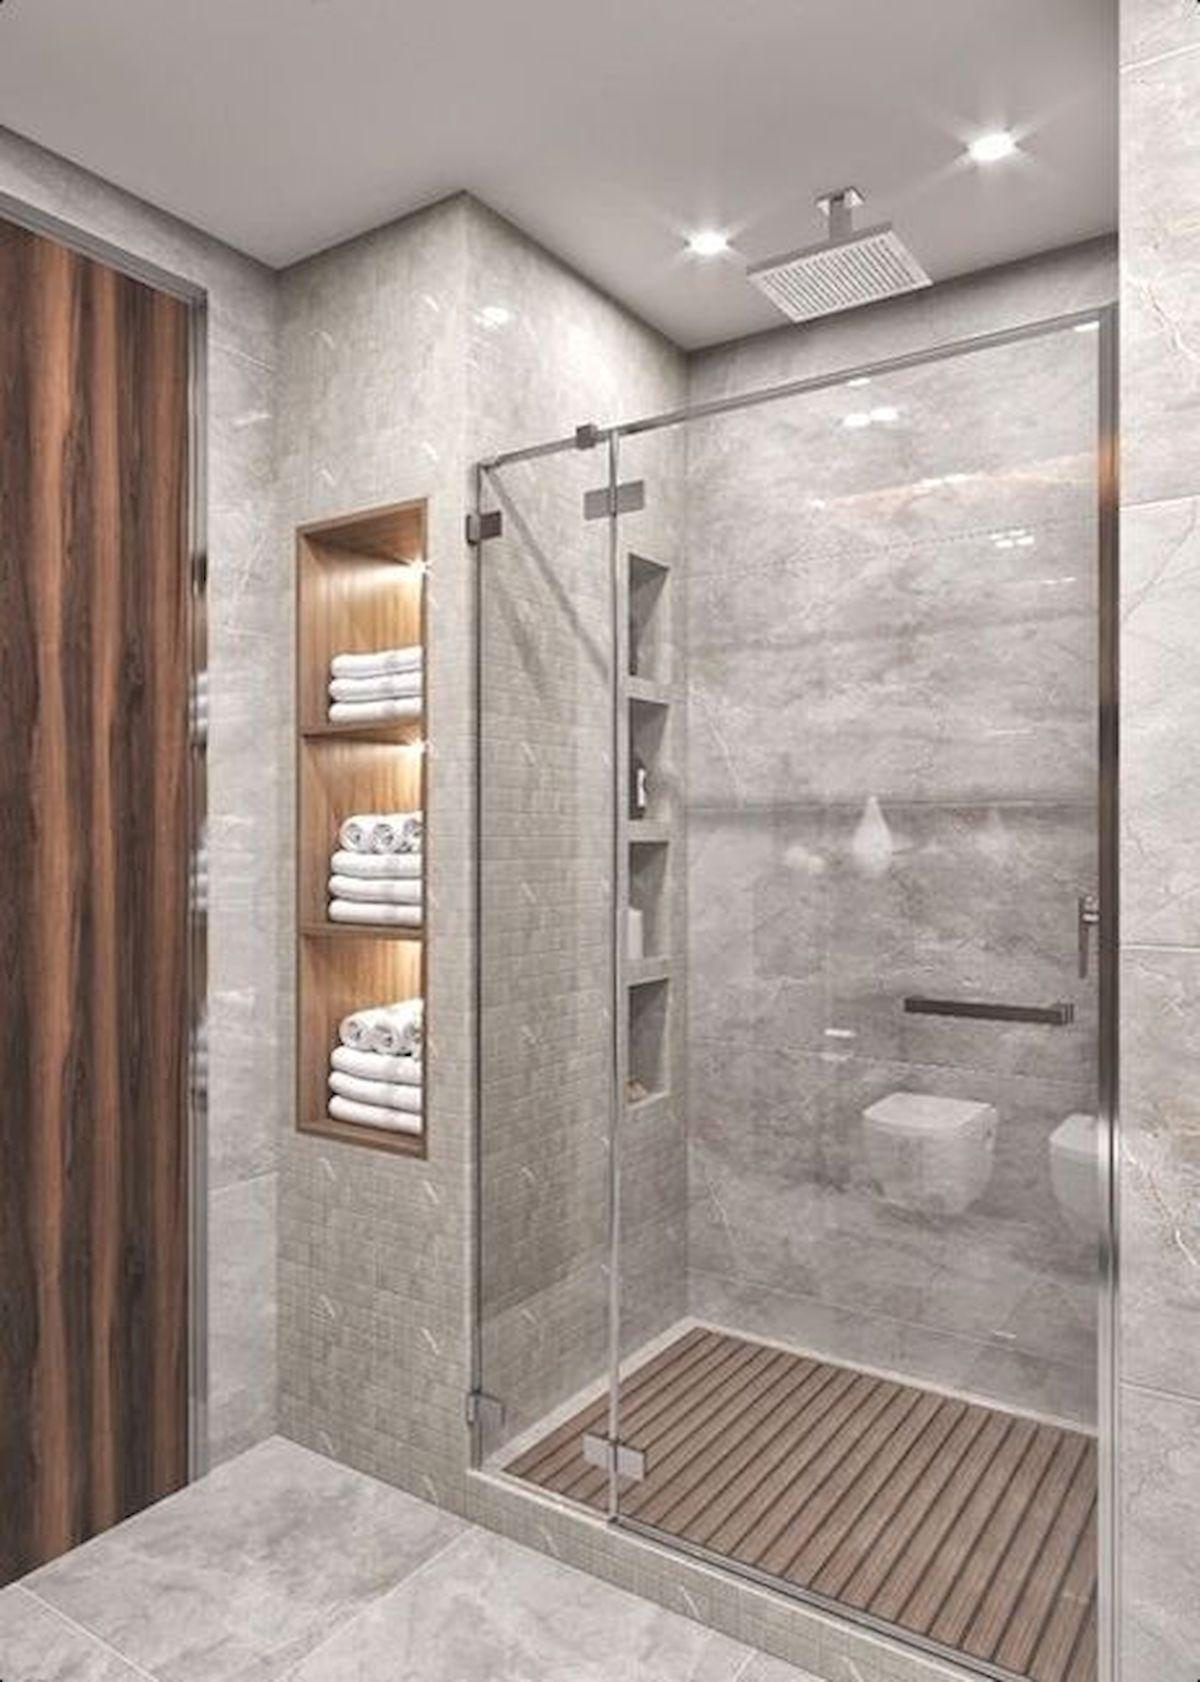 50 Stunning Small Bathroom Makeover Ideas – CoachDecor.com ...